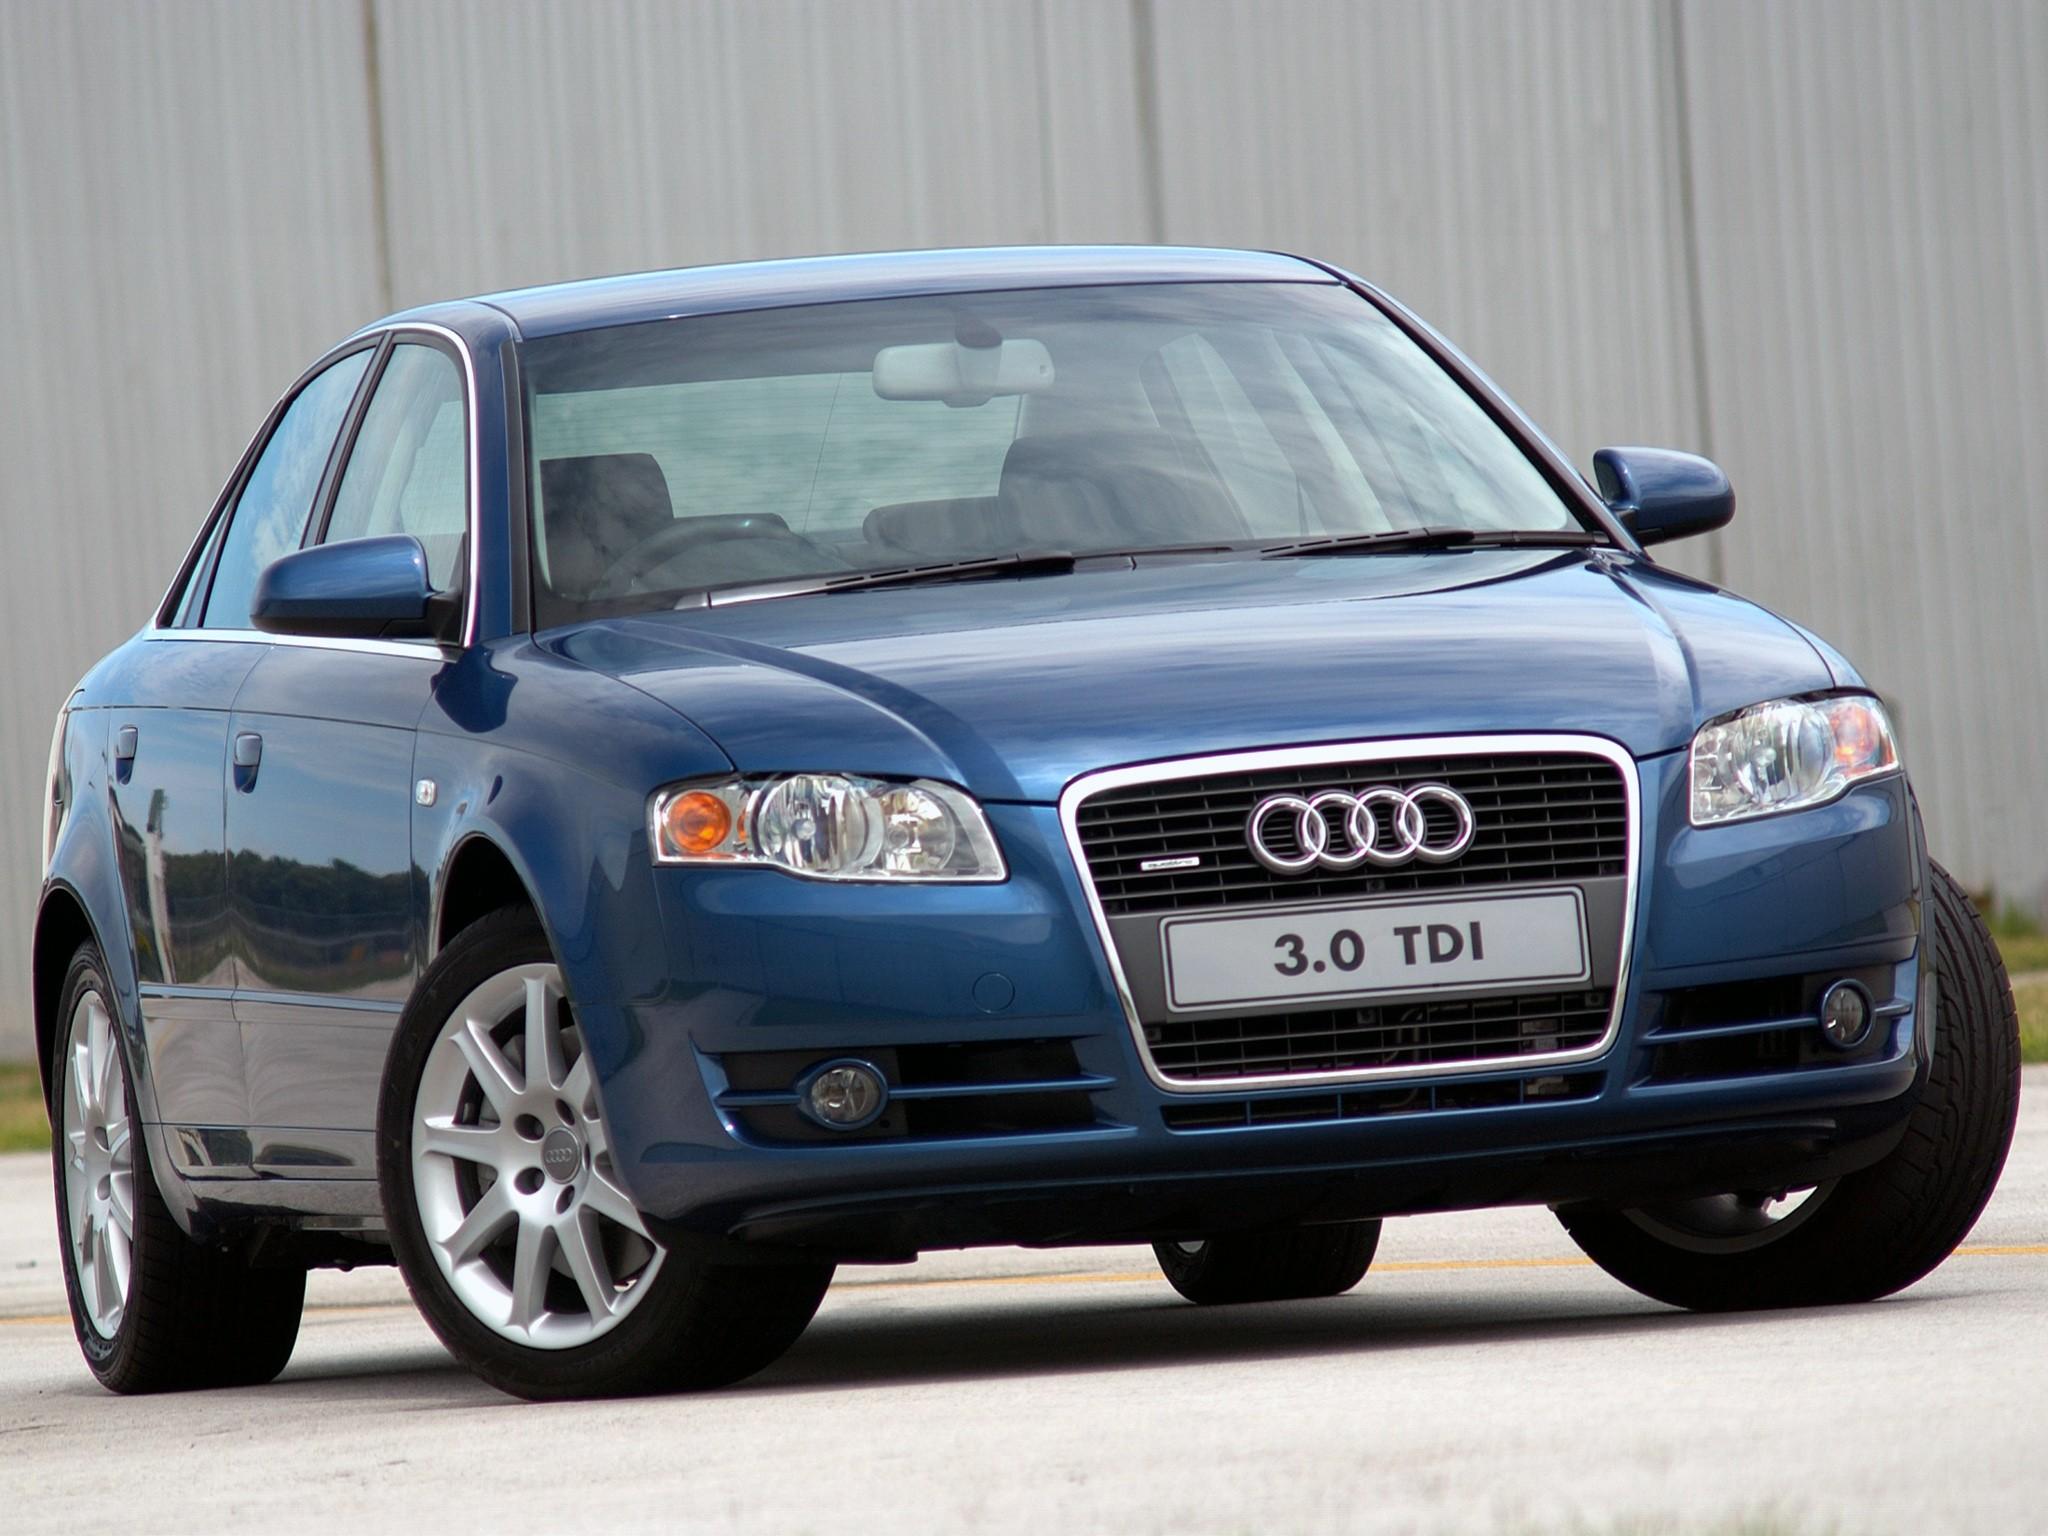 Audi A4 Specs Photos 2004 2005 2006 2007 Autoevolution